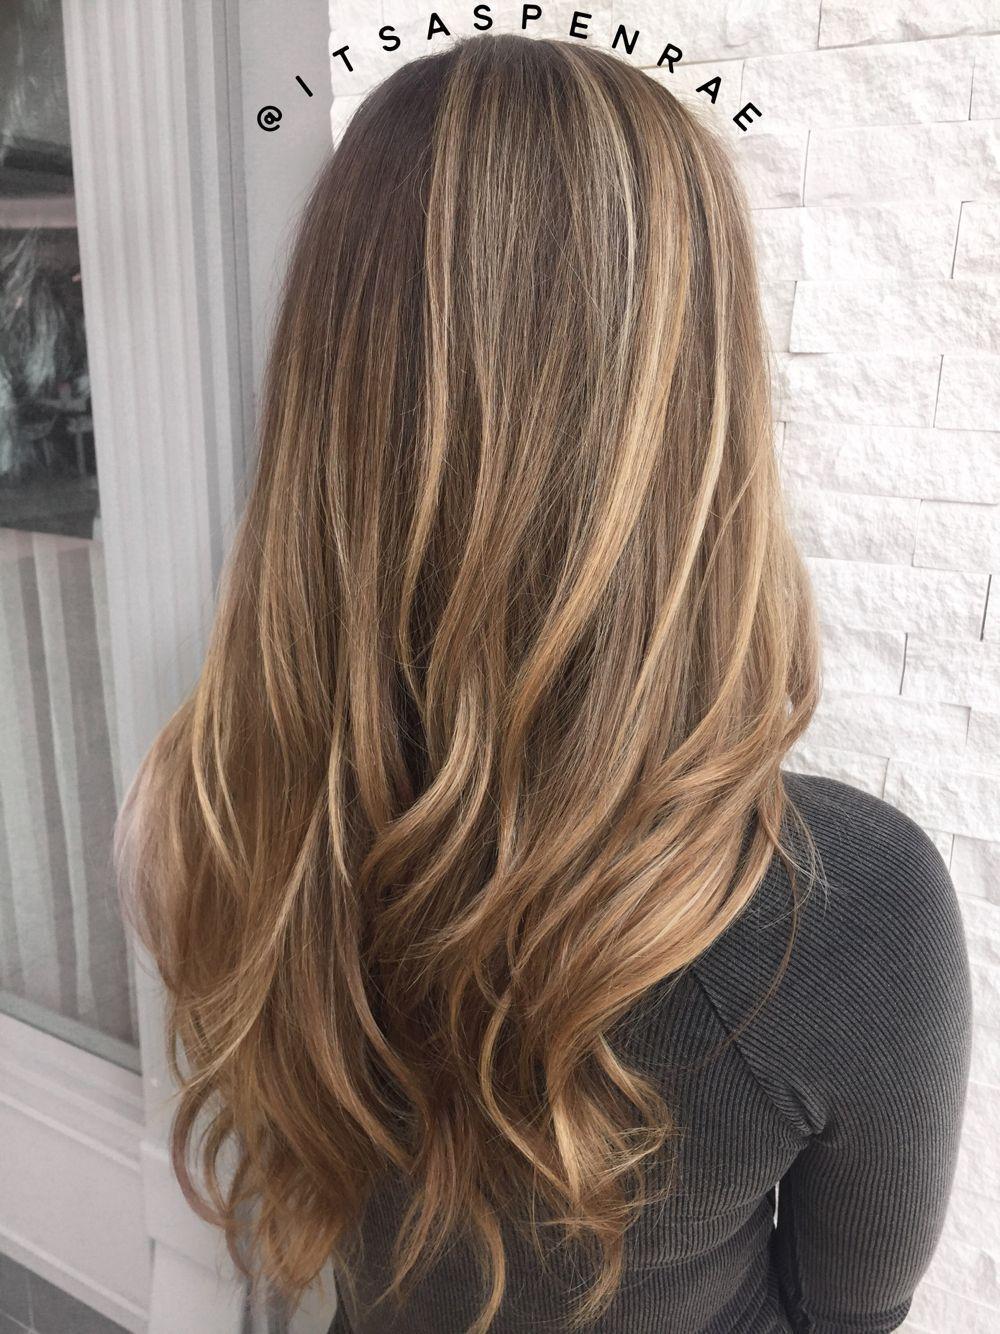 Ash Blonde Wigs For Women Dark Ash Blond Light Beige Blonde Hair Color Wigsblonde Haare Balayage Lange Haare Ideen Haarfarben